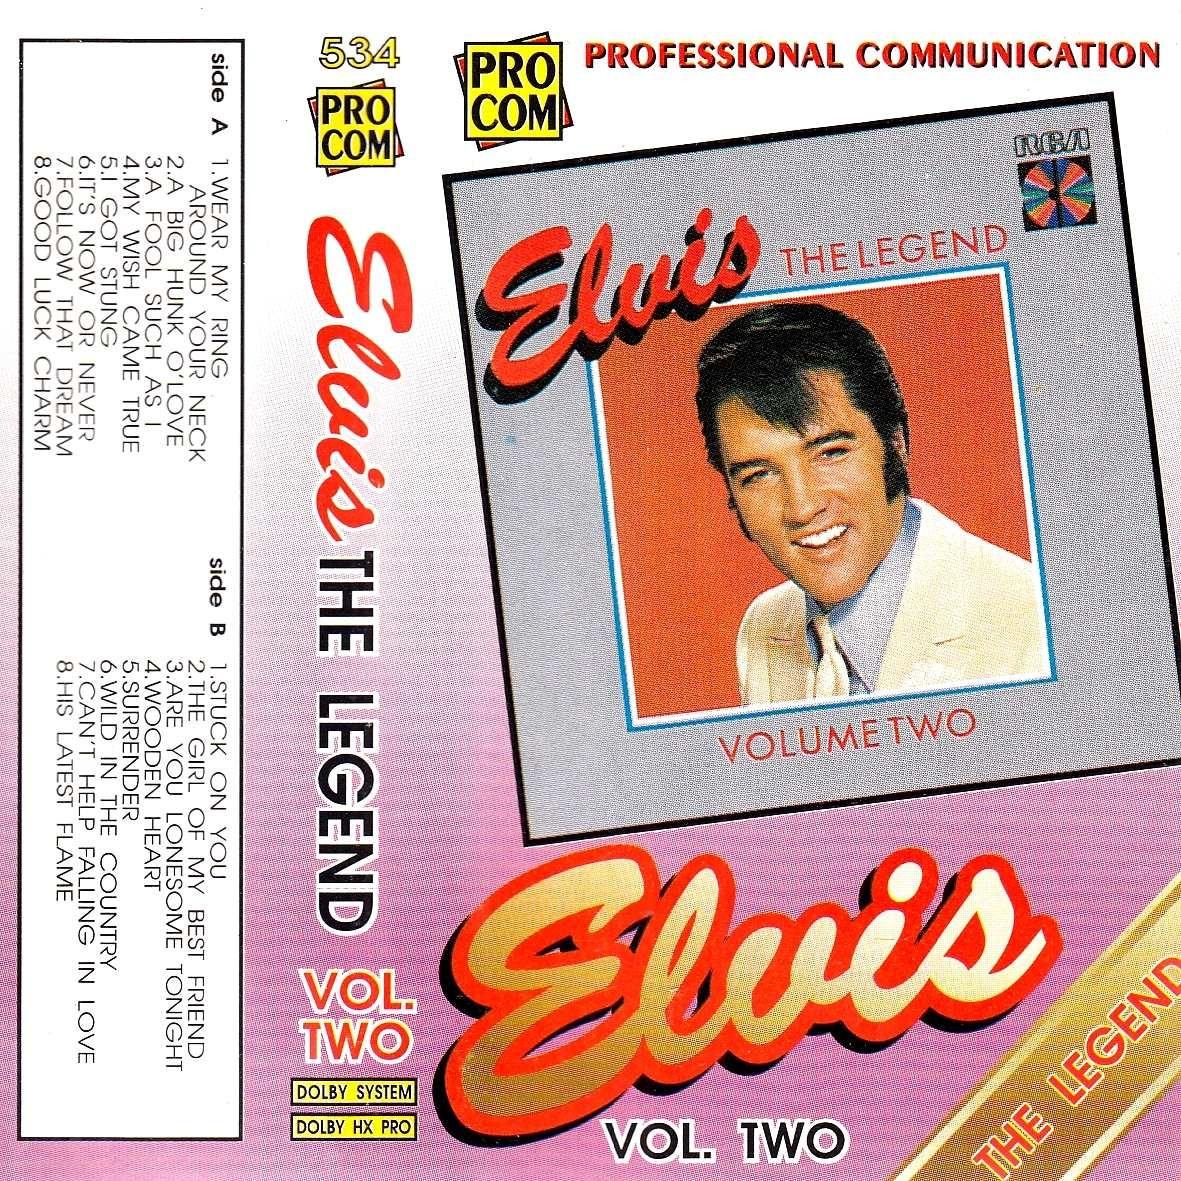 Presley Elvis - The Legend Vol Two